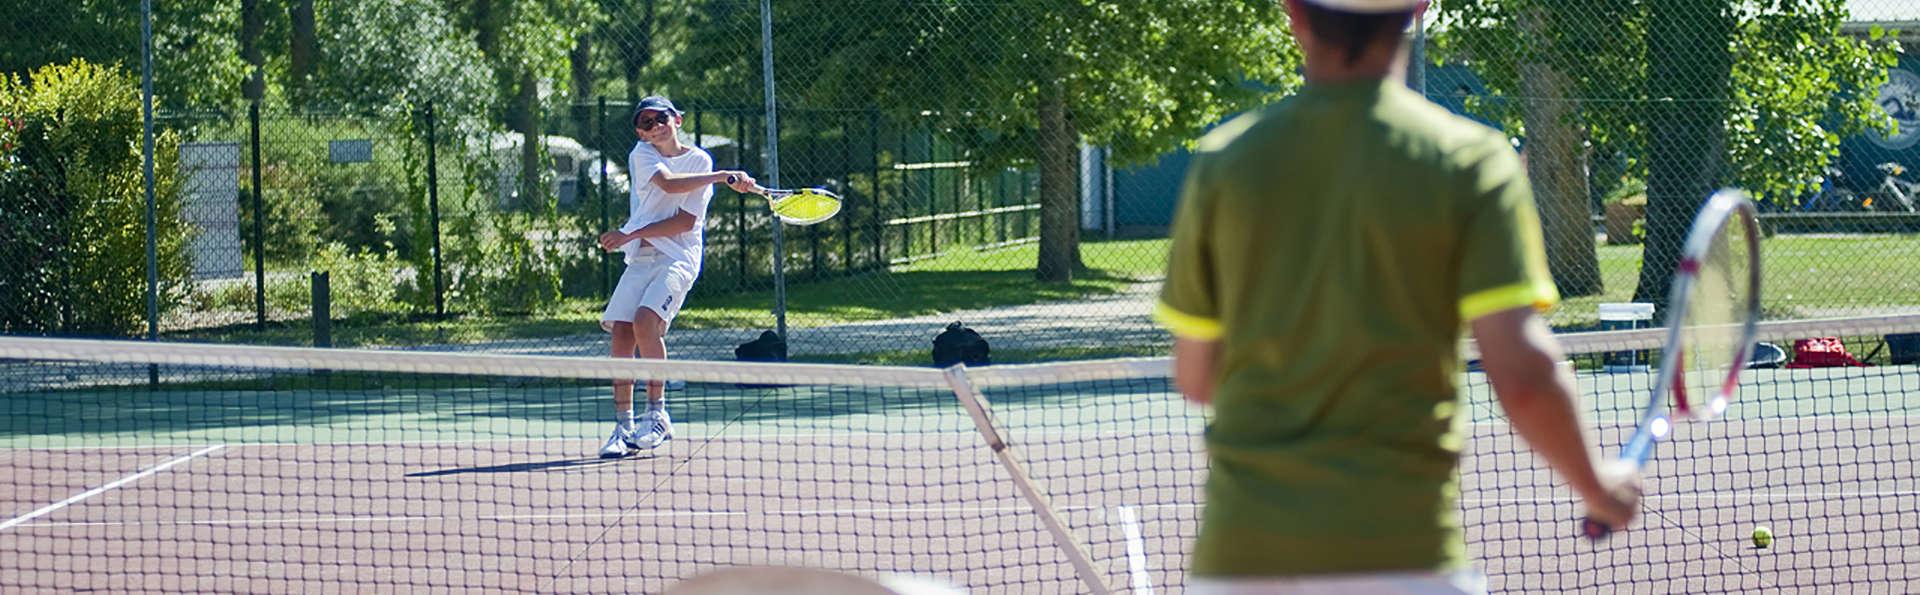 Huttopia Les Châteaux - Edit_Tennis.jpg